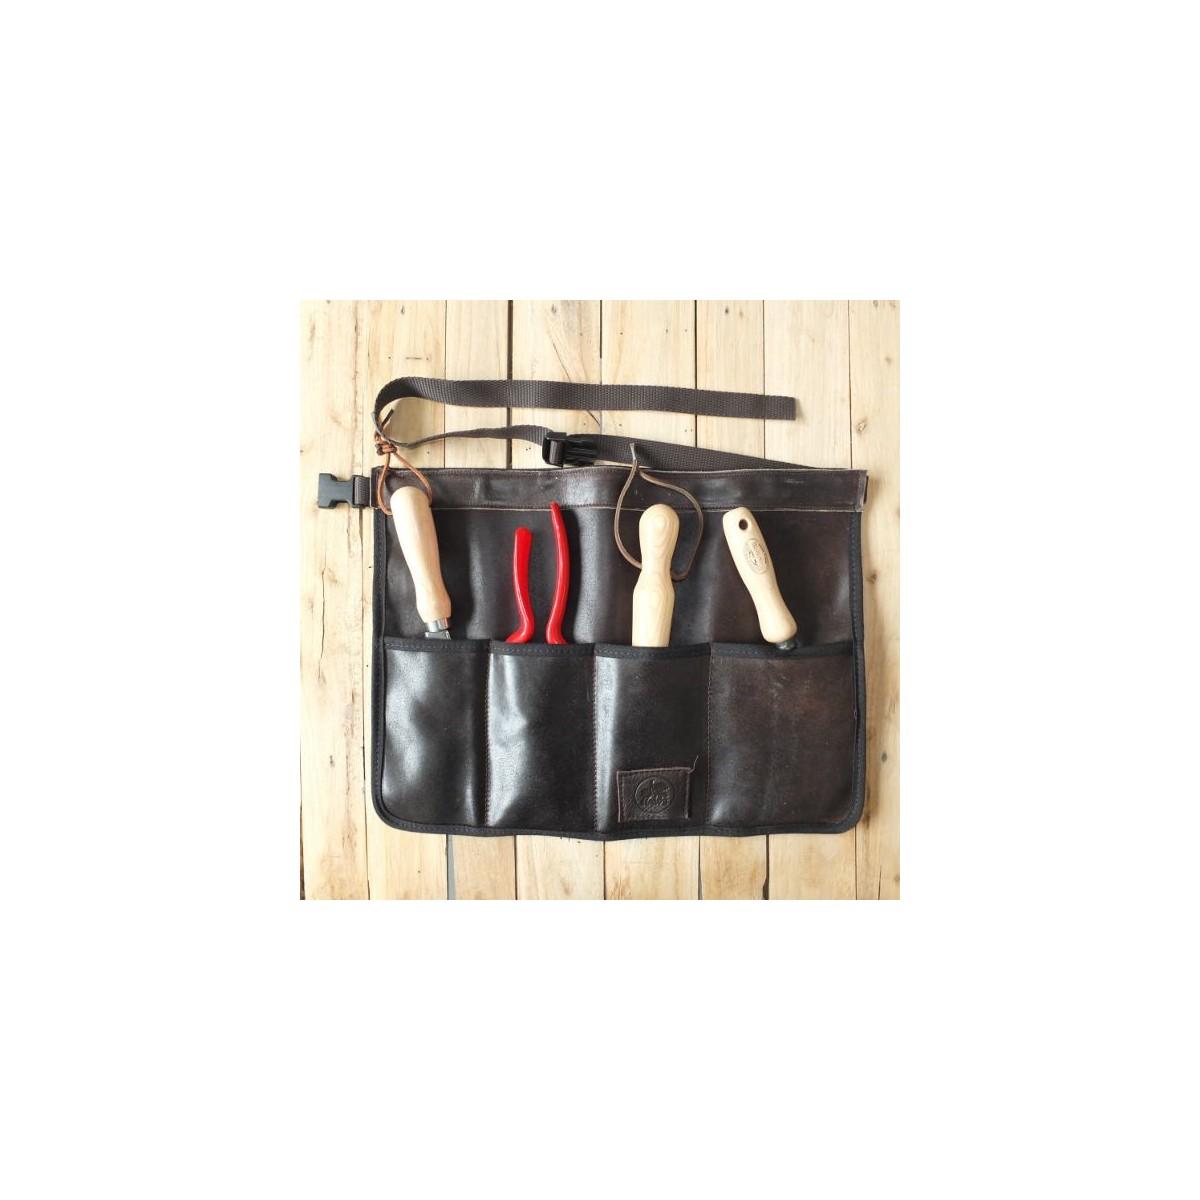 tablier ceinture porte outils en cuir botanique editions. Black Bedroom Furniture Sets. Home Design Ideas